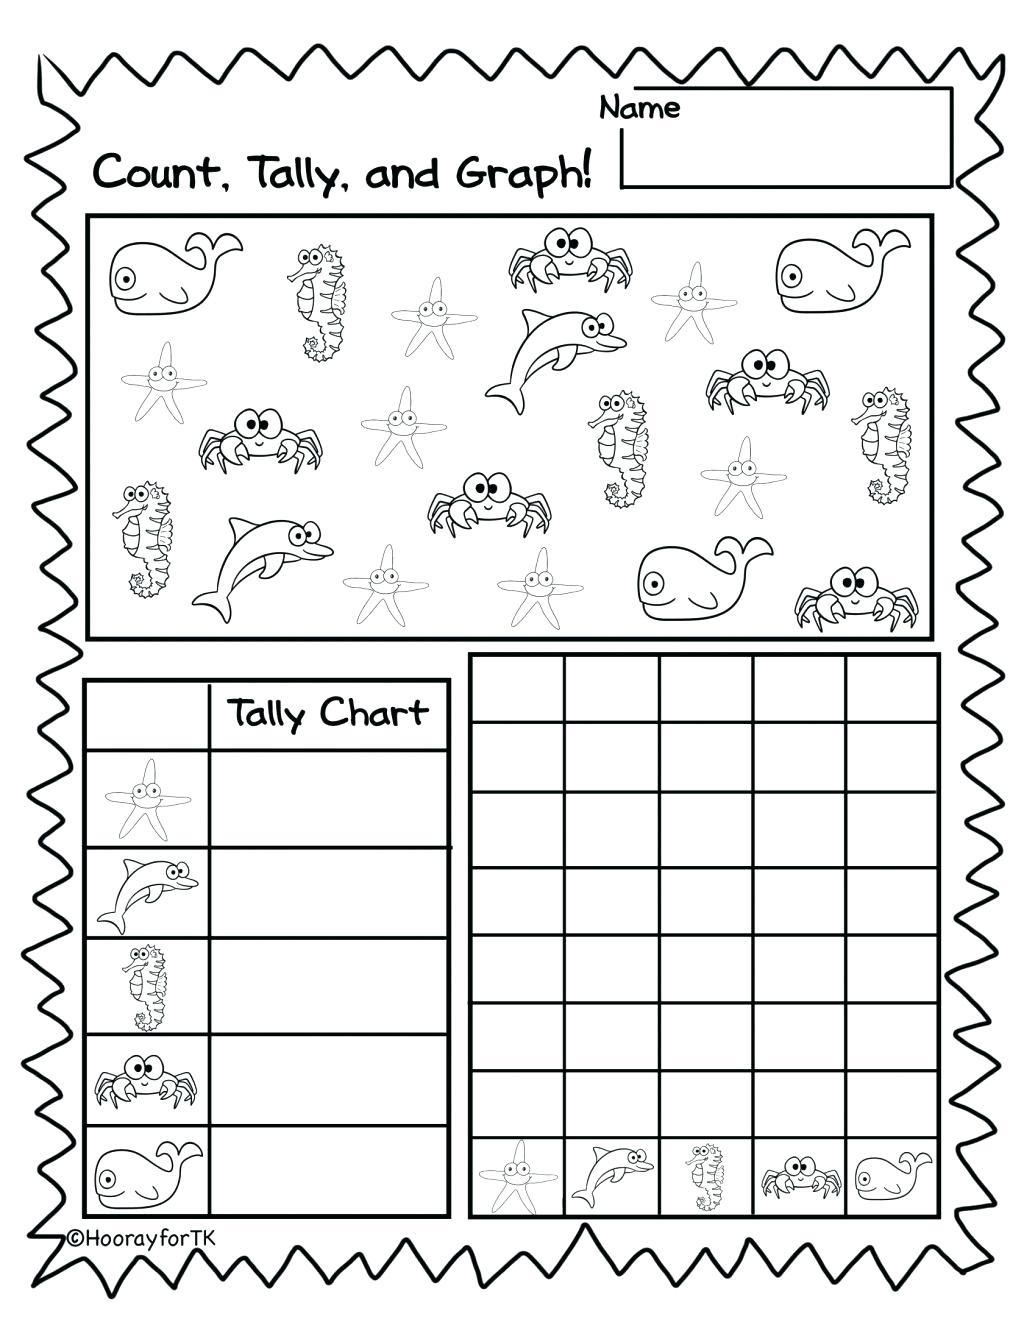 Kindergarten Graphing Worksheets Kindergarten Christmas Graphing - Free Printable Graphs For Kindergarten